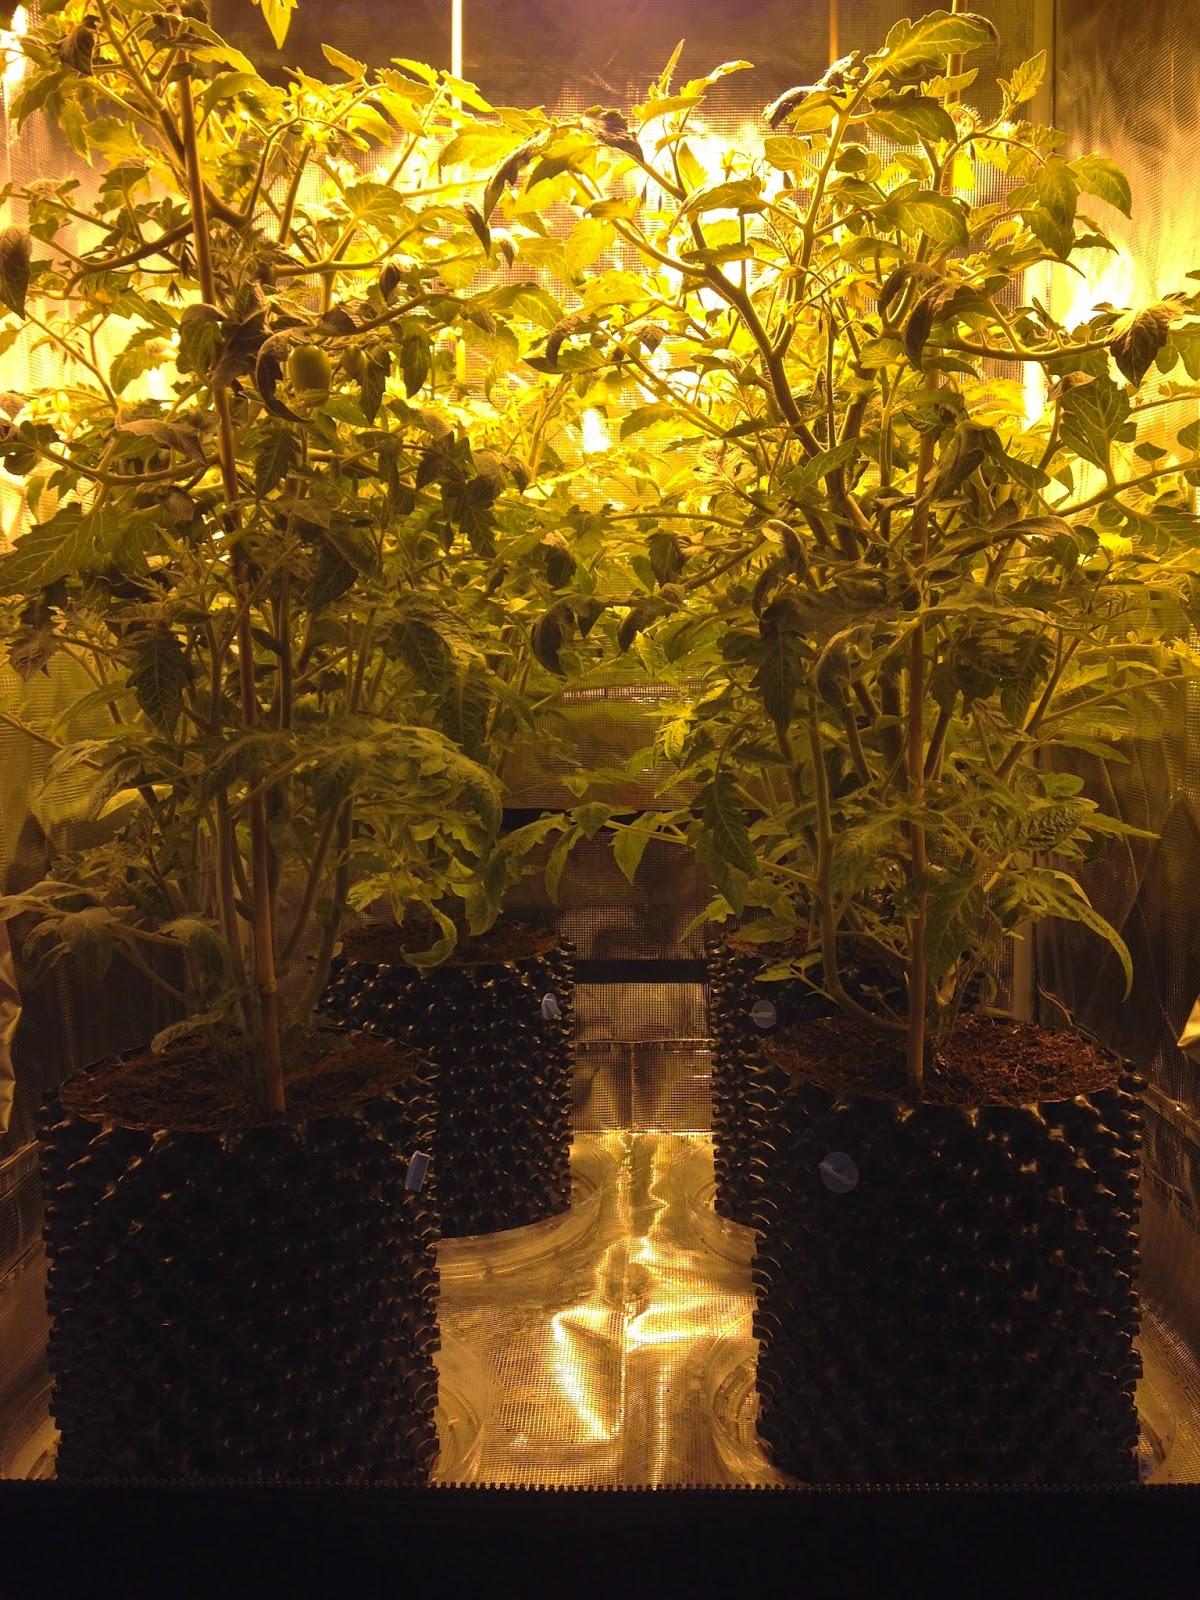 The Grow Room Special Premium 3 X3 Grow Tent Set Up